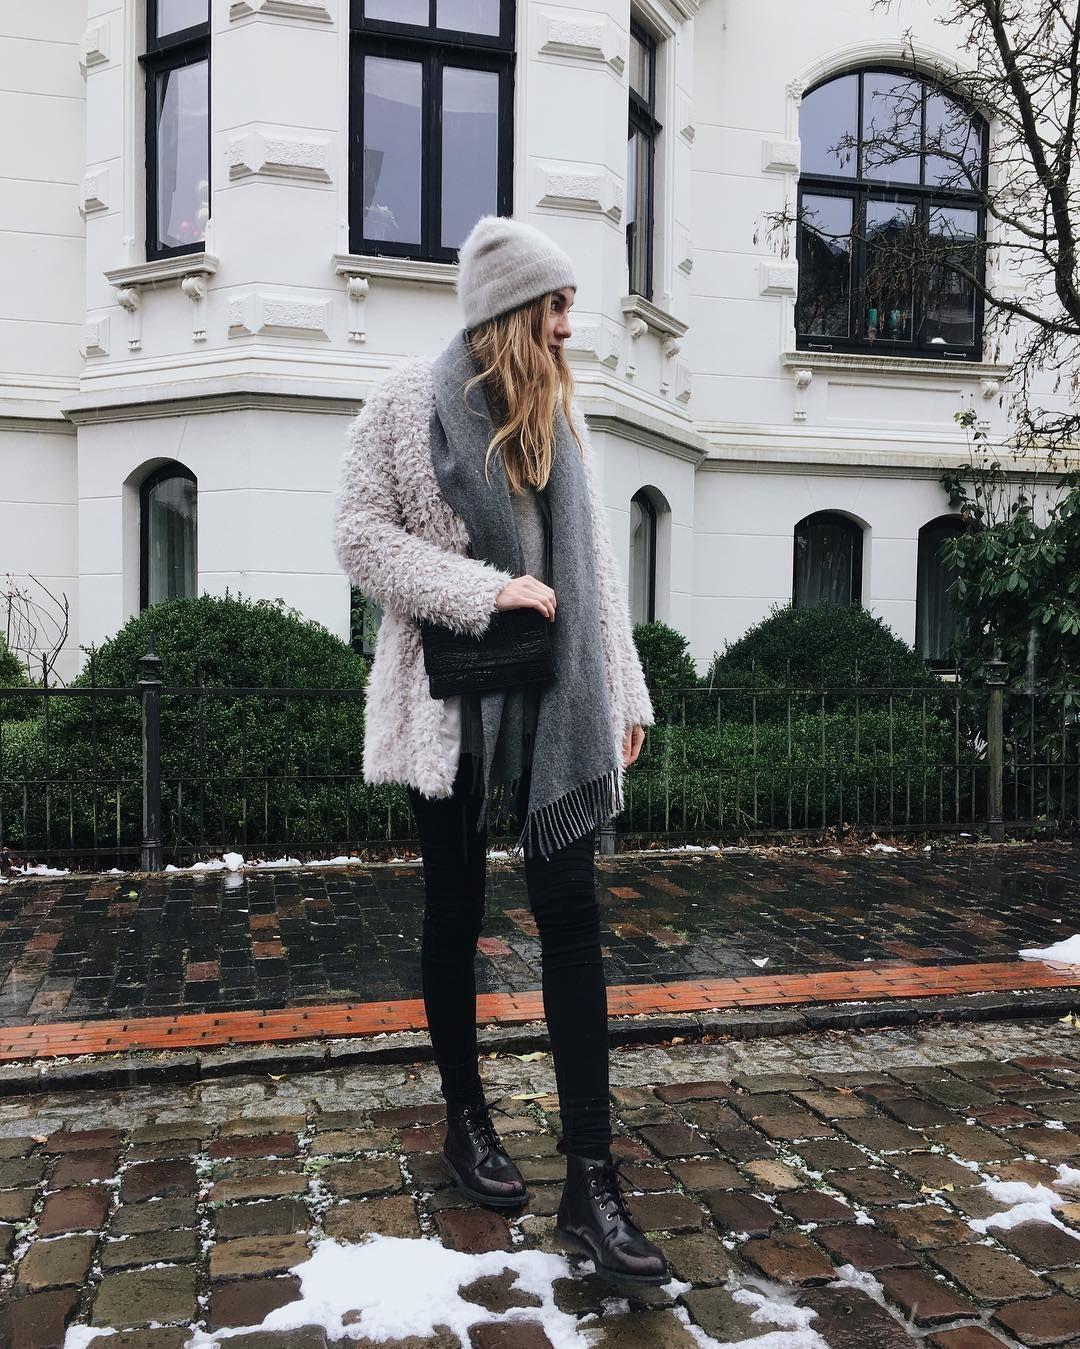 Instagram @euphoria_the : teddy jacket, fake fur, oversized, doc martens,  acne